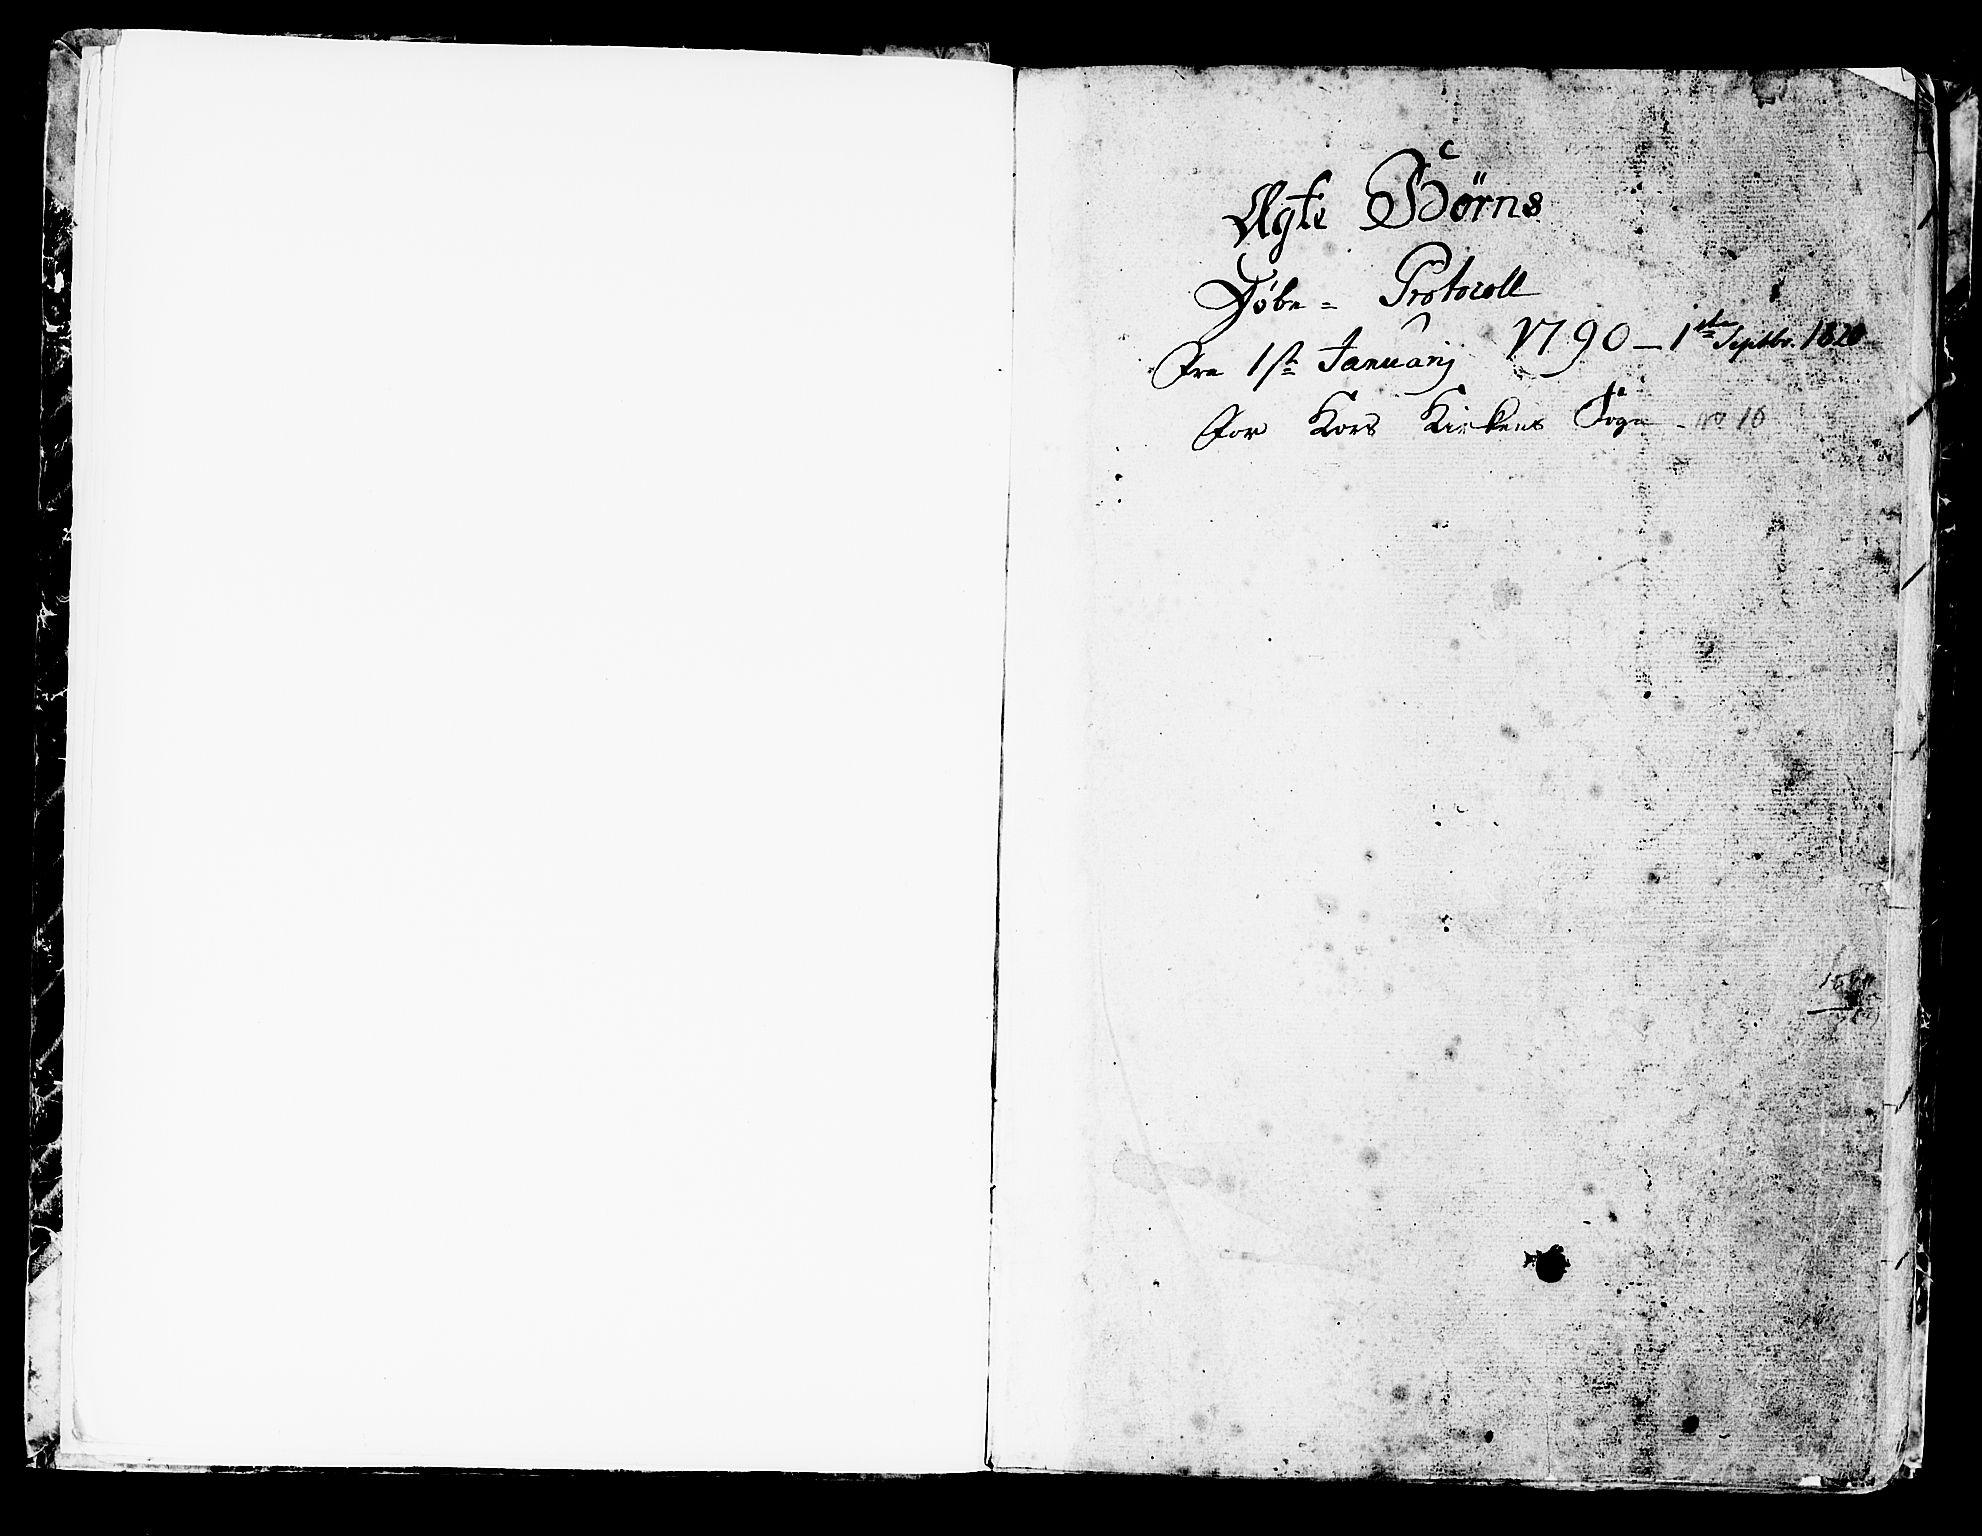 SAB, Korskirken Sokneprestembete, H/Haa/L0006: Ministerialbok nr. A 6, 1790-1820